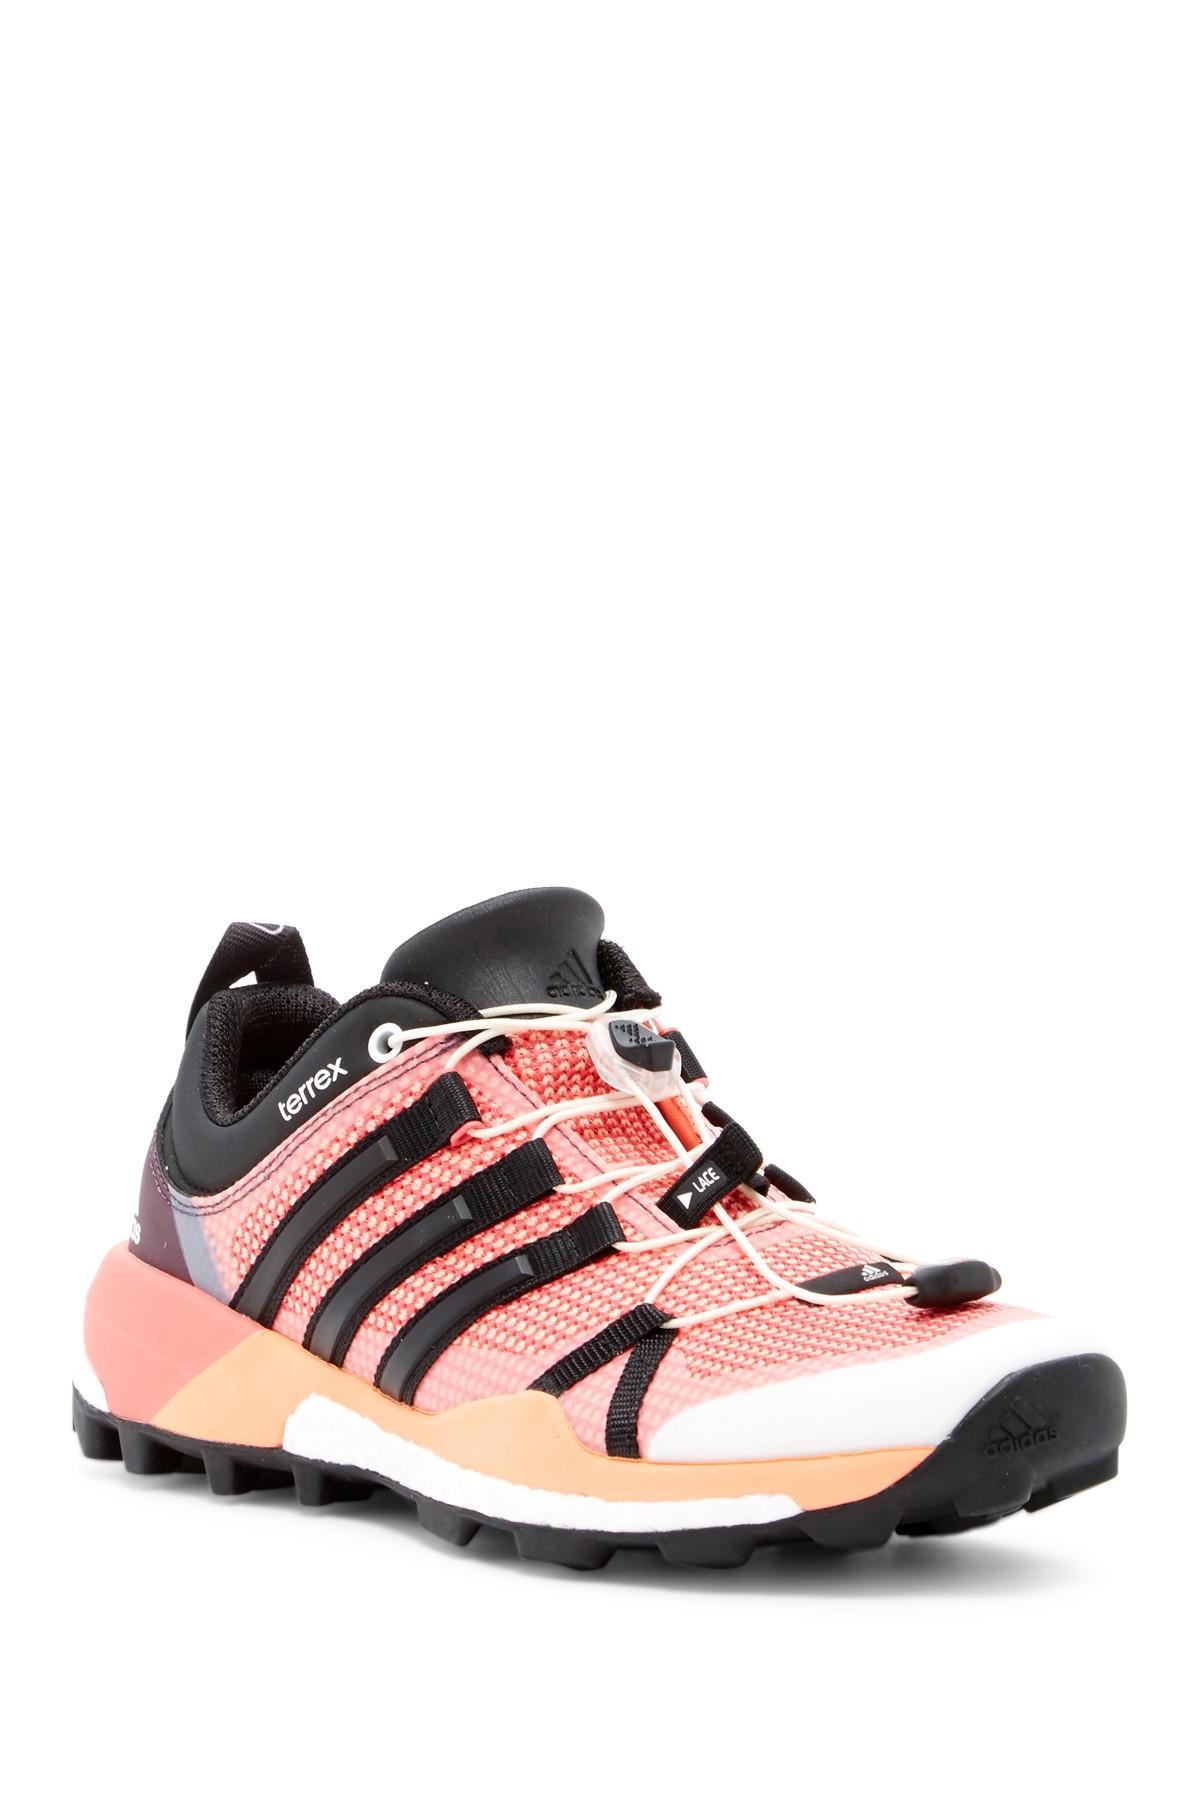 lyst adidas originali terrex skychaser scarpa